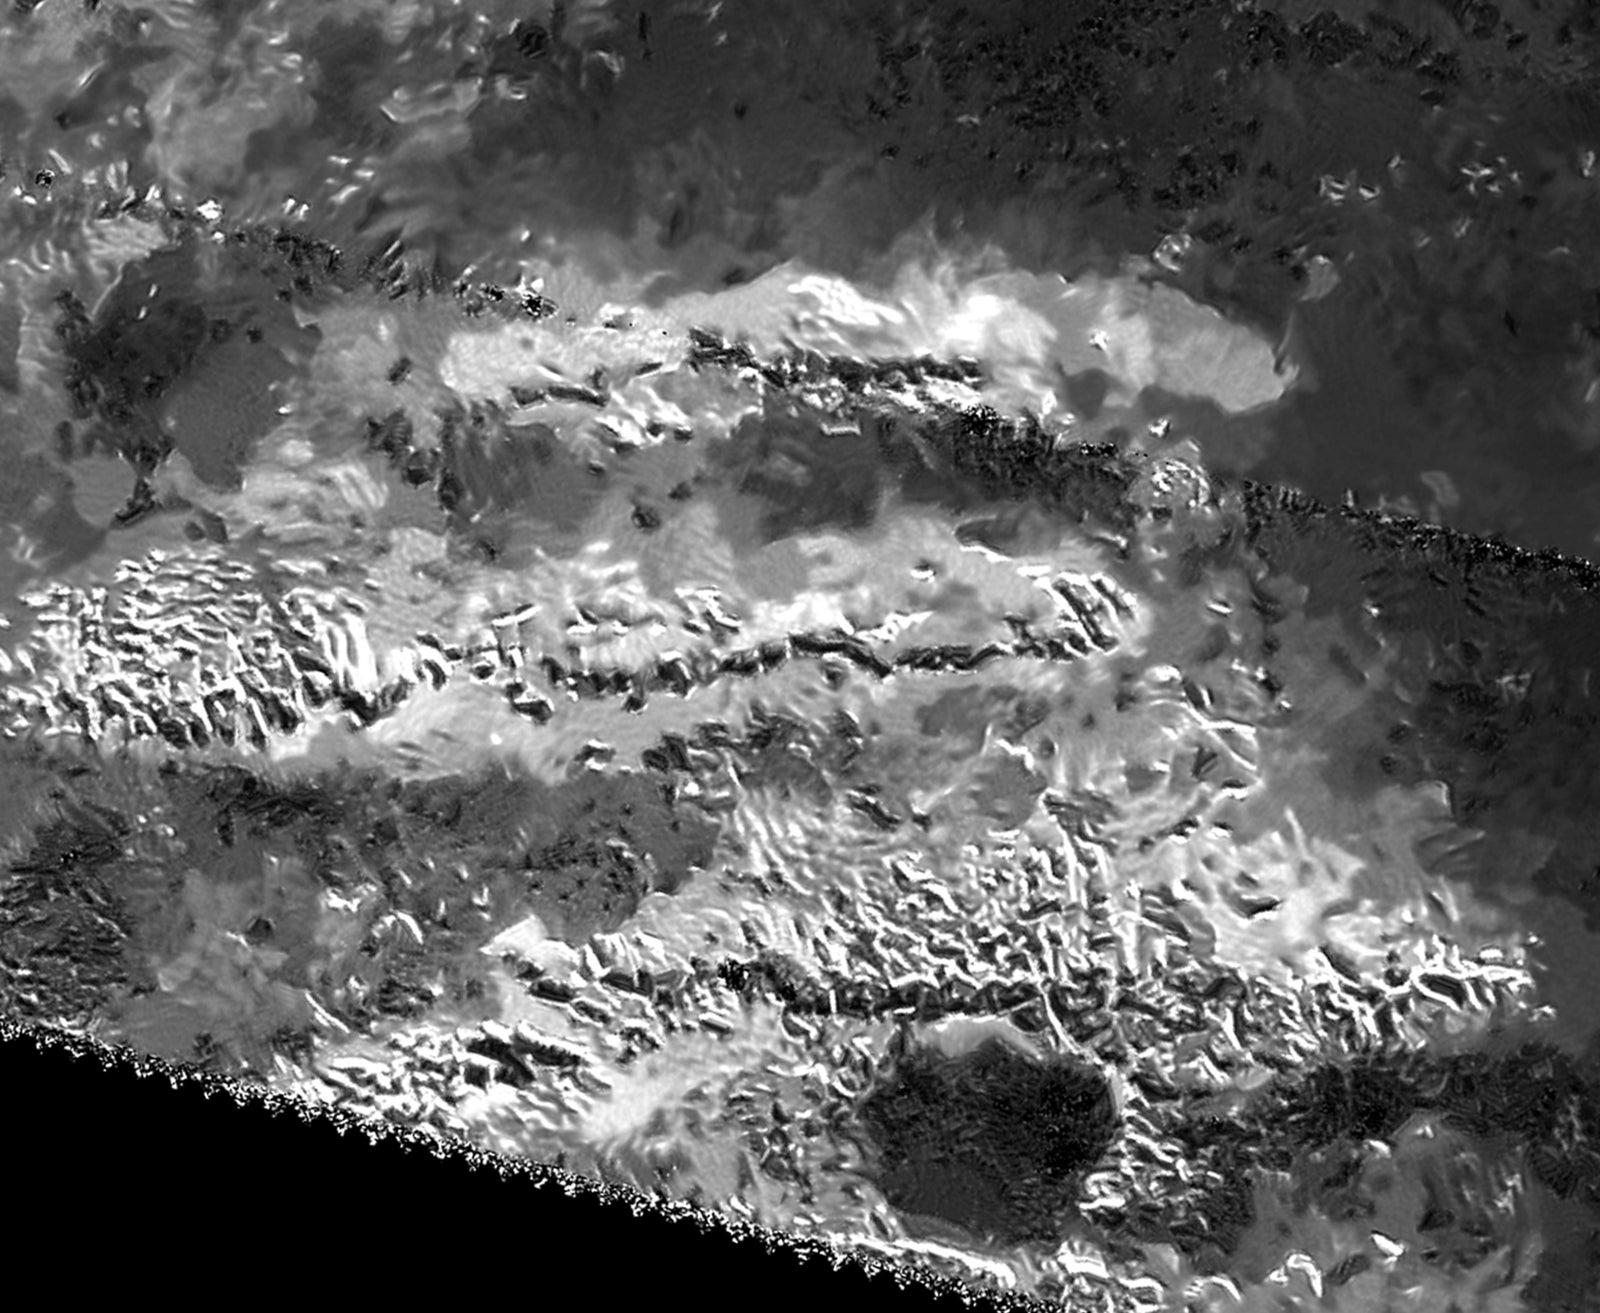 Probe Finds Massive Icy Mountain On Saturn's Moon Titan